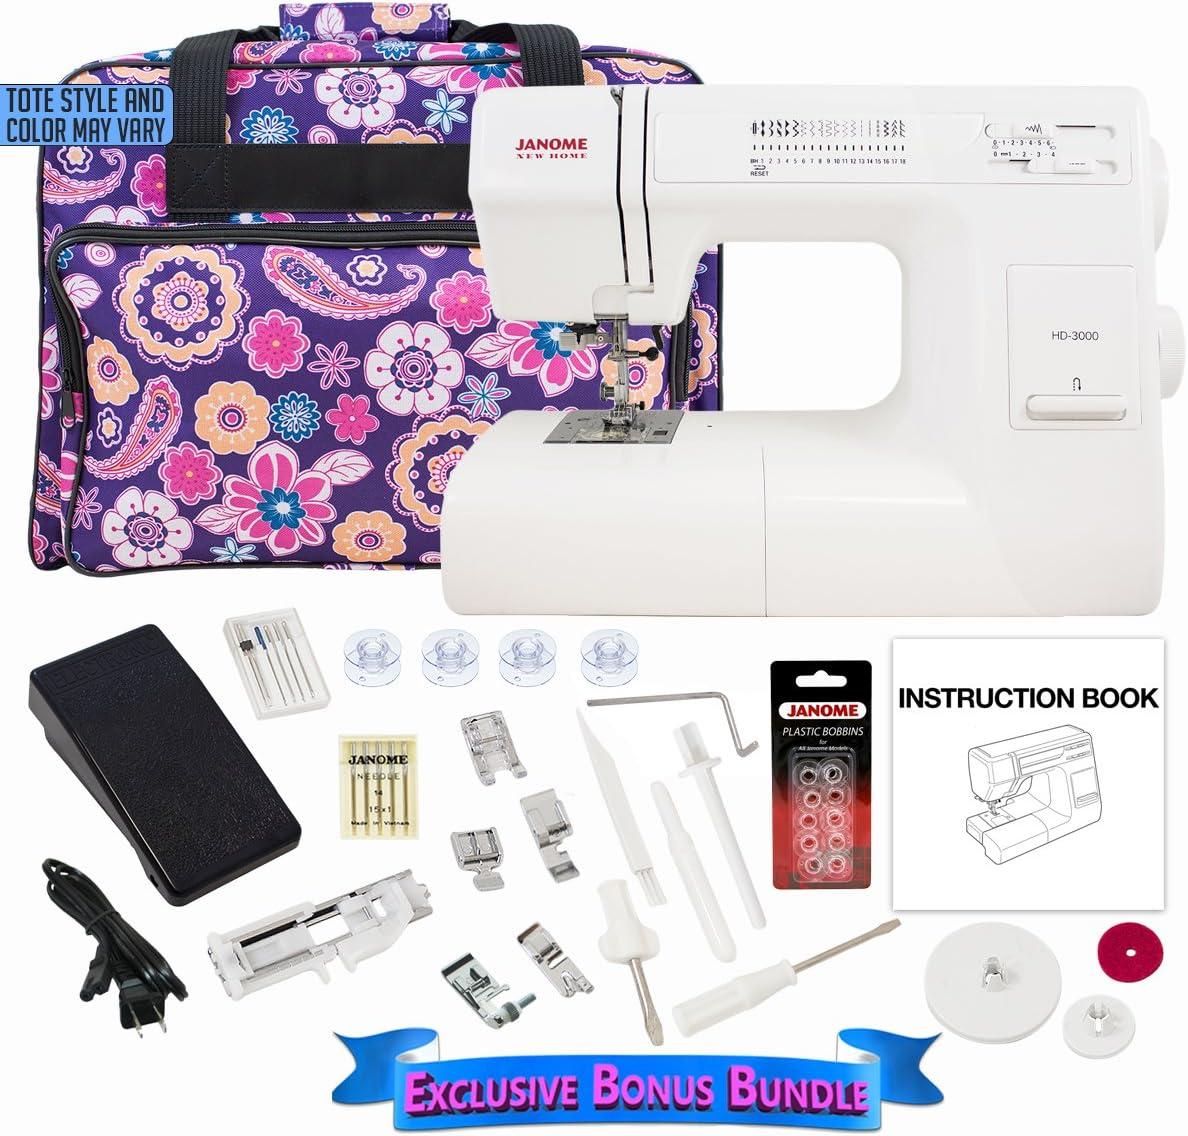 Janome HD3000 Sewing Machine Bundle with Purple Tote, Janome bobbins and Needles